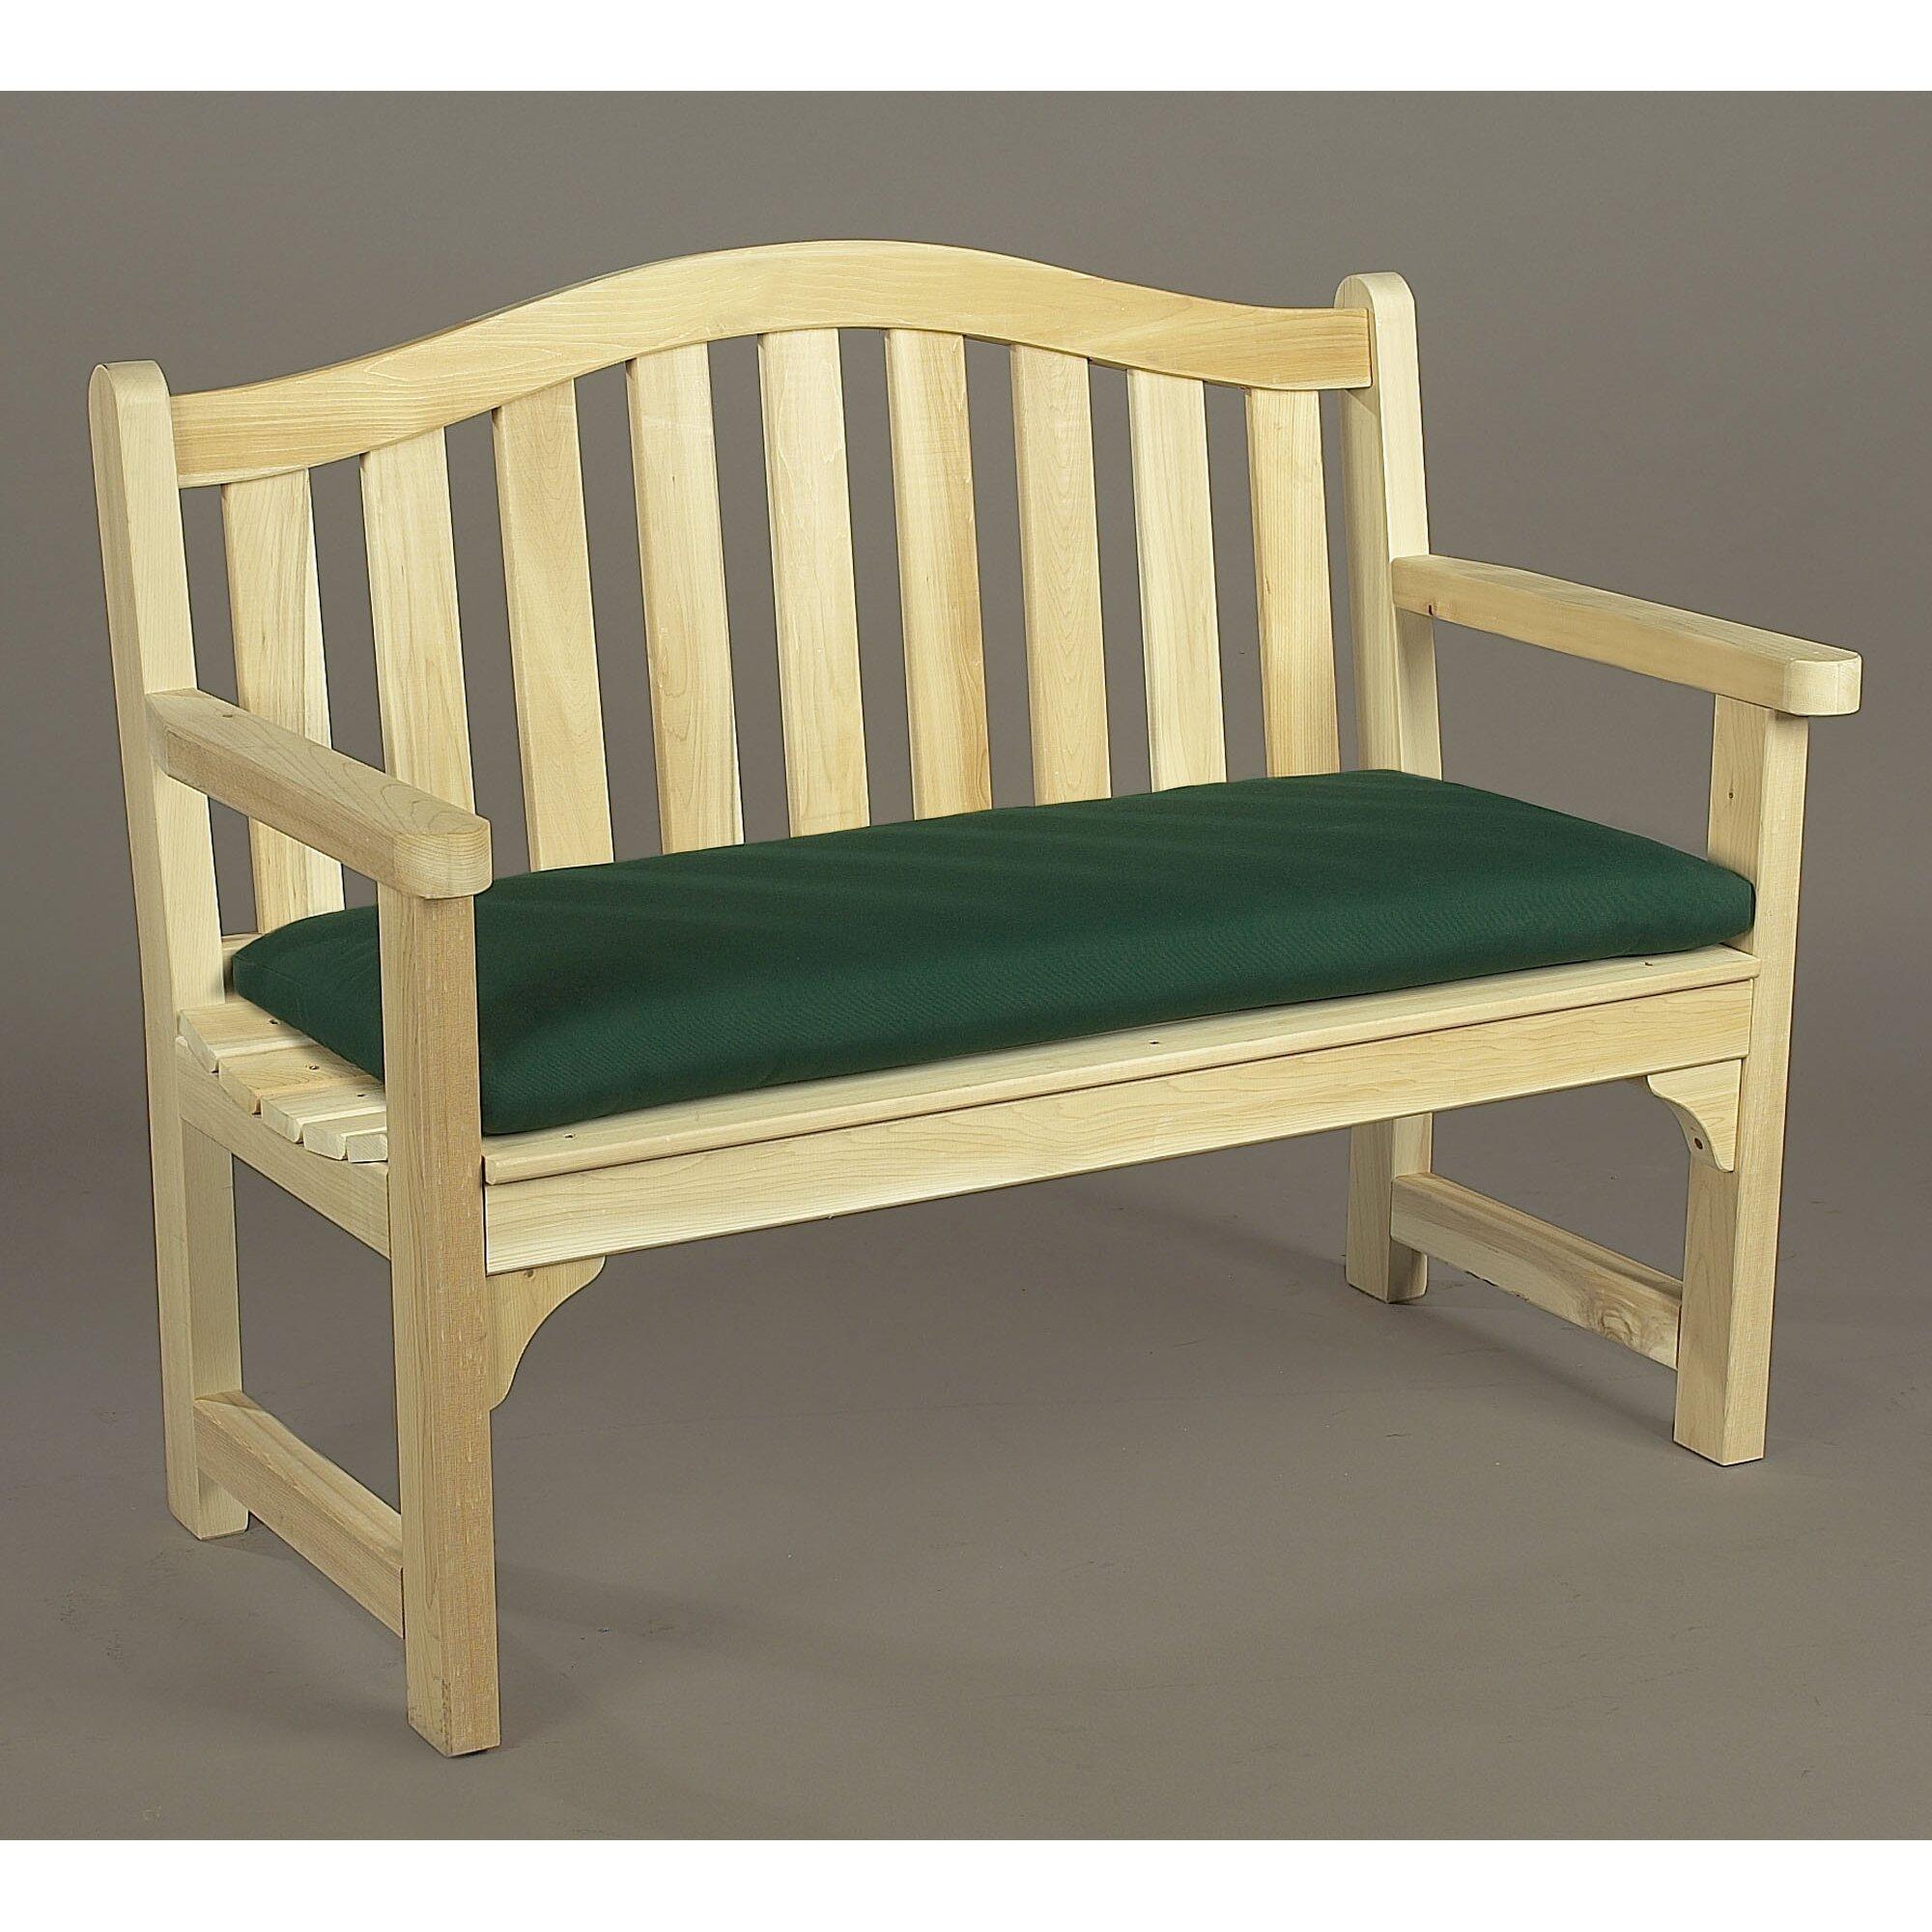 rustic cedar cedar camel back wood bench reviews wayfair. Black Bedroom Furniture Sets. Home Design Ideas